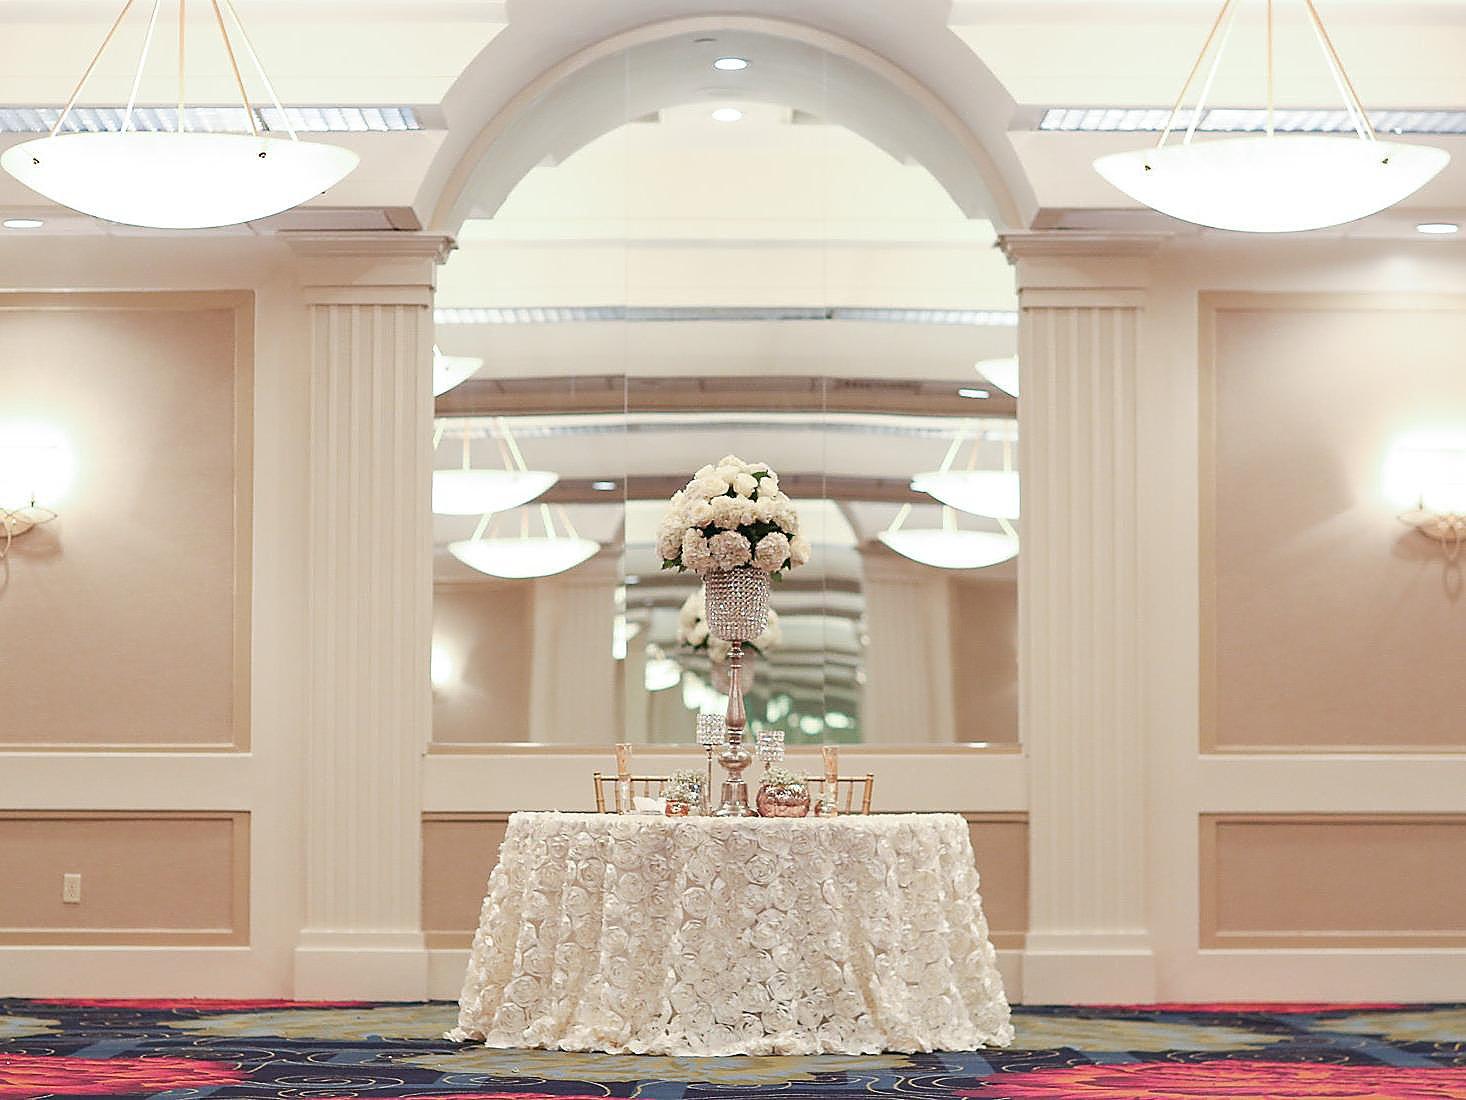 Admirable Crowne Plaza Virginia Beach Town Center Hotel Meeting Download Free Architecture Designs Scobabritishbridgeorg